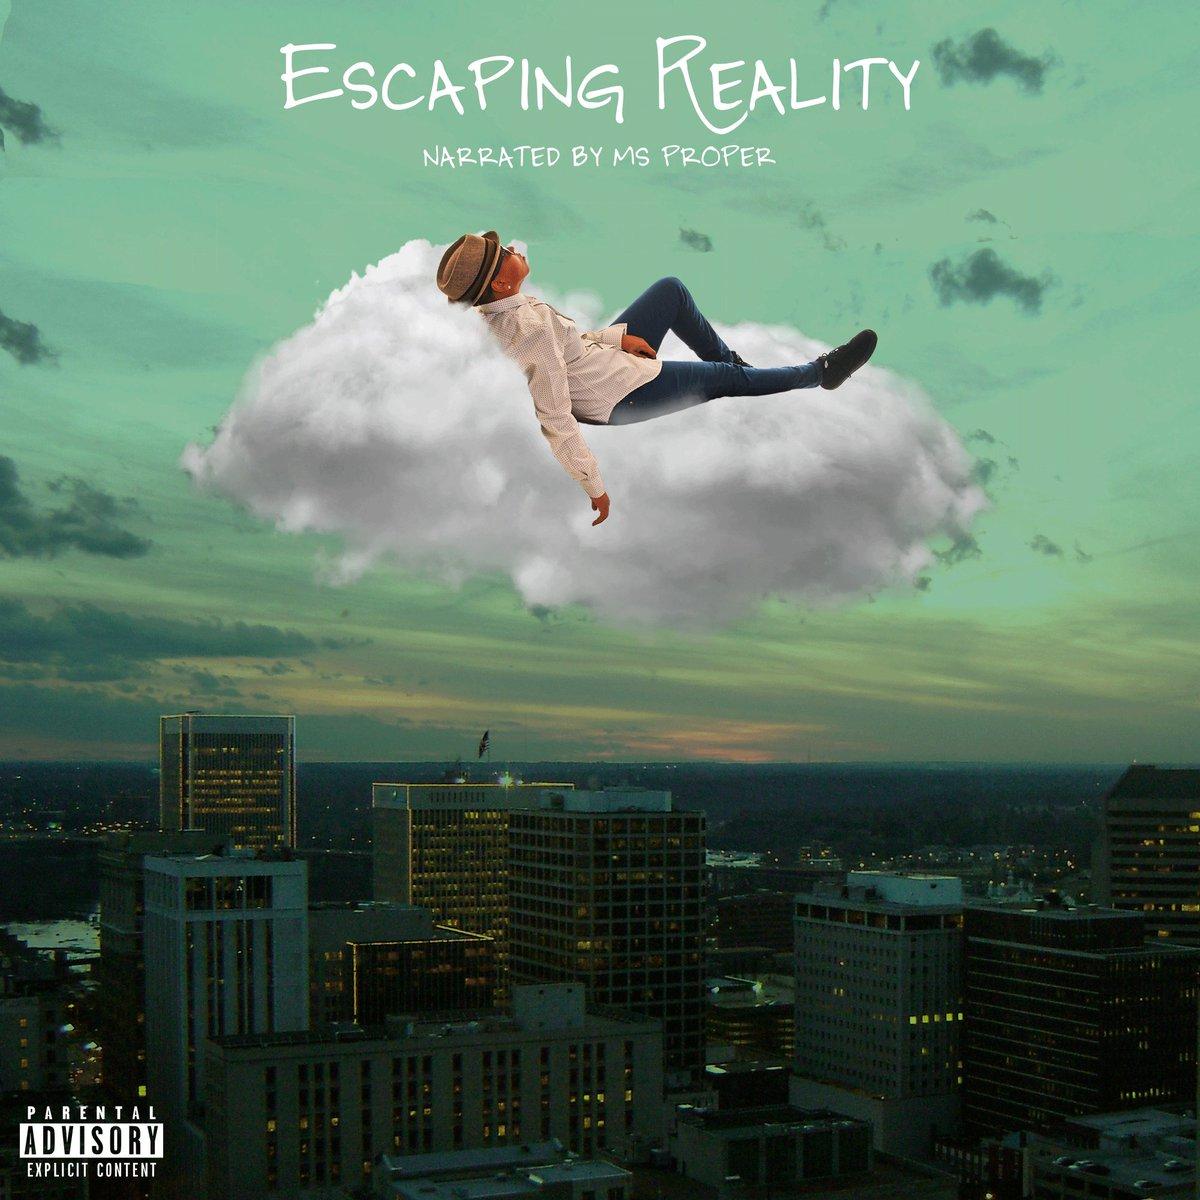 NEW MUSIC: #EscapingReality [ALBUM] https://t.co/srVdoYTZbf https://t.co/AyeOa1VSIE